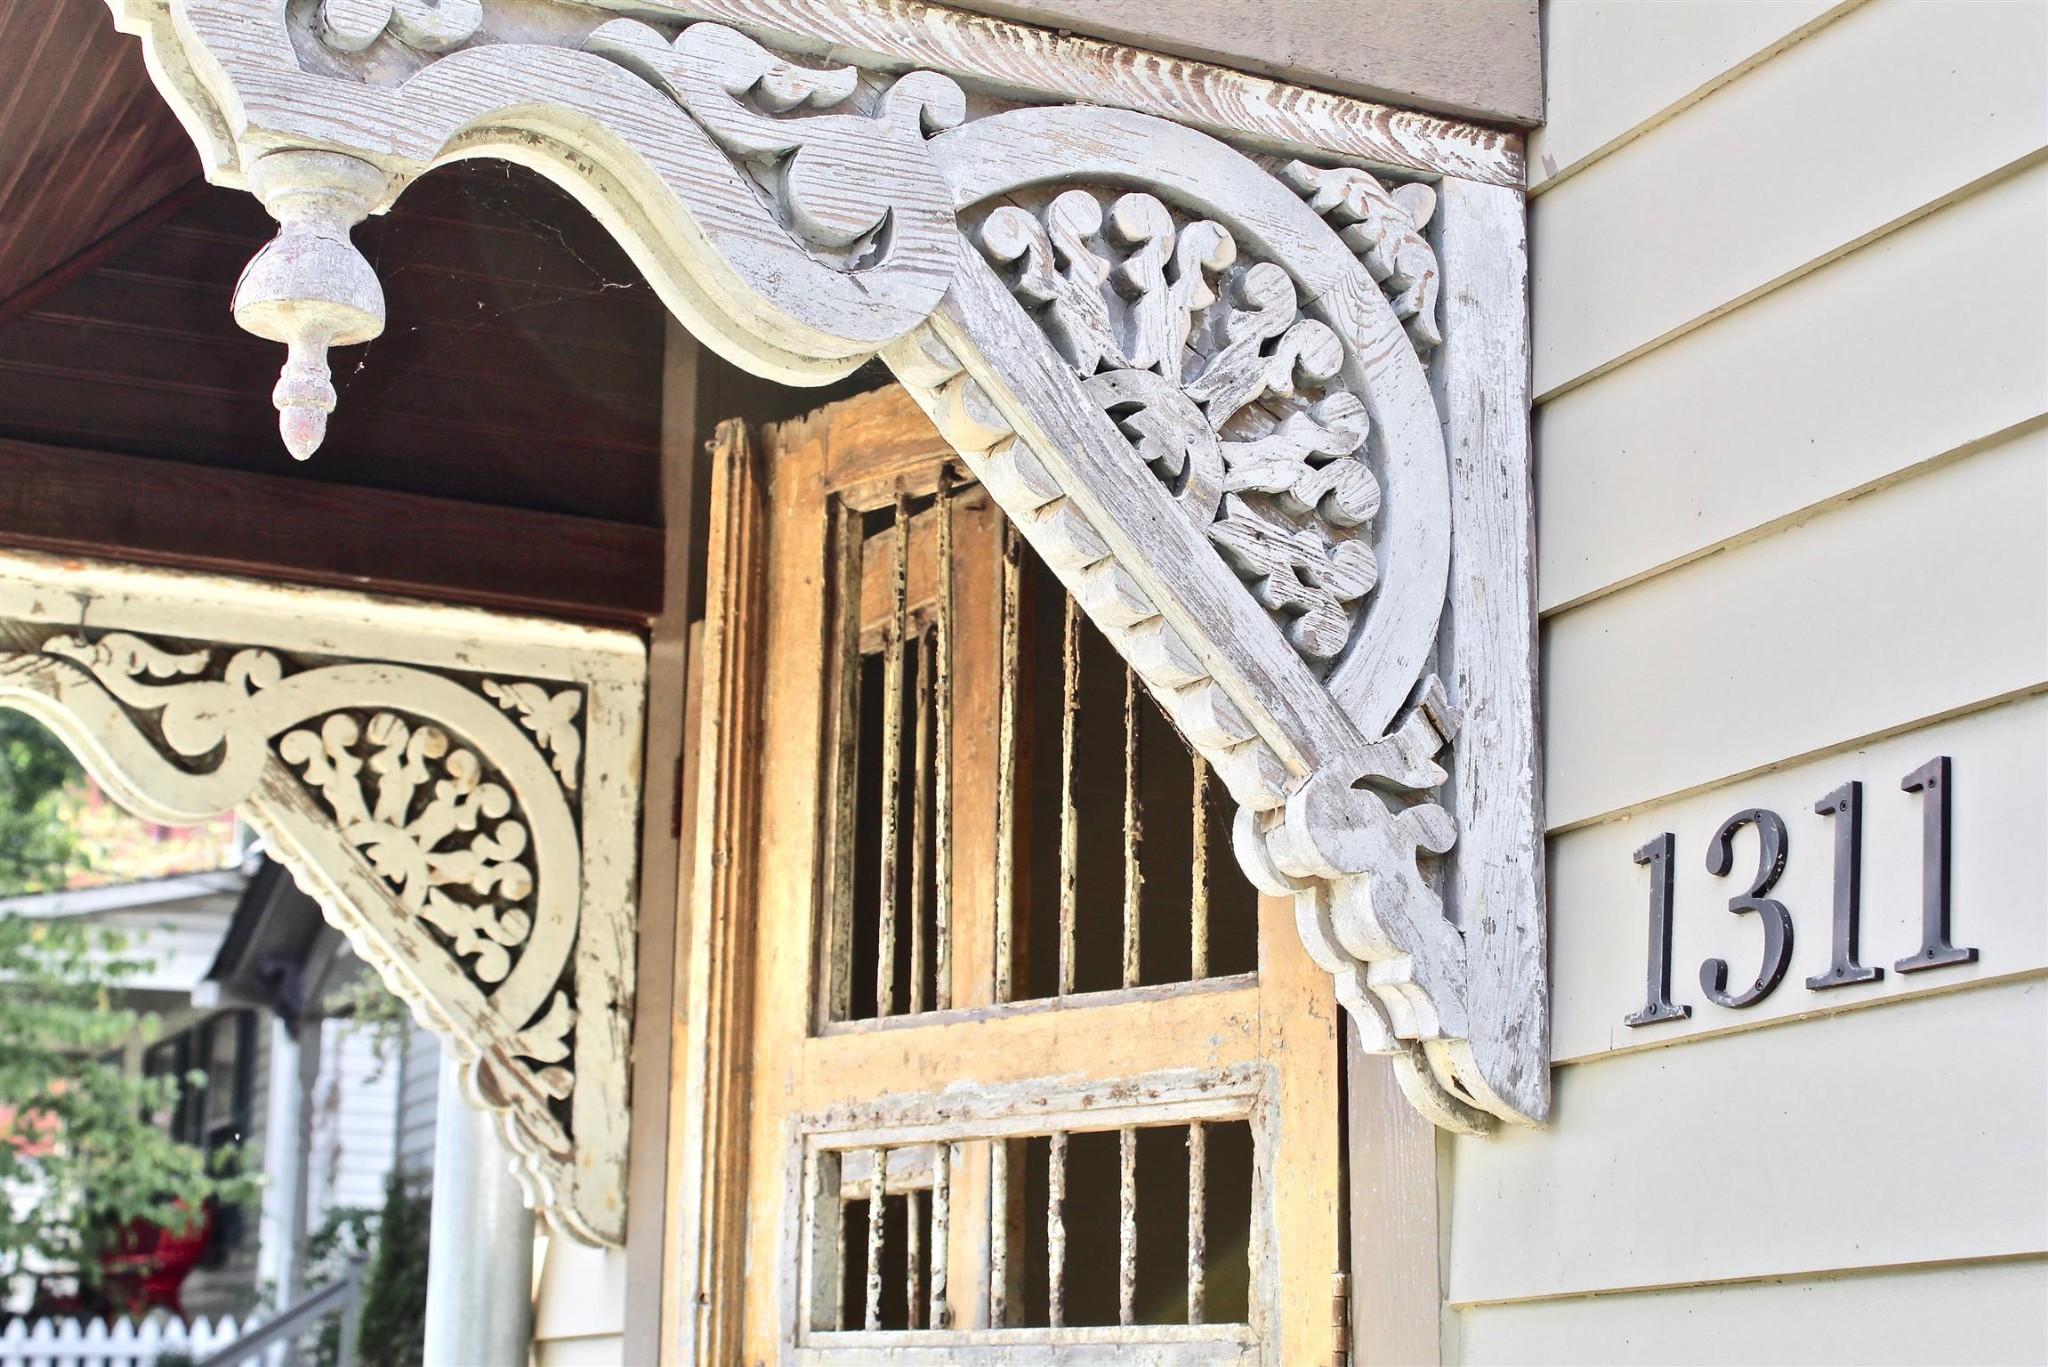 1311 7th Ave, N, Nashville, TN 37208 - Nashville, TN real estate listing